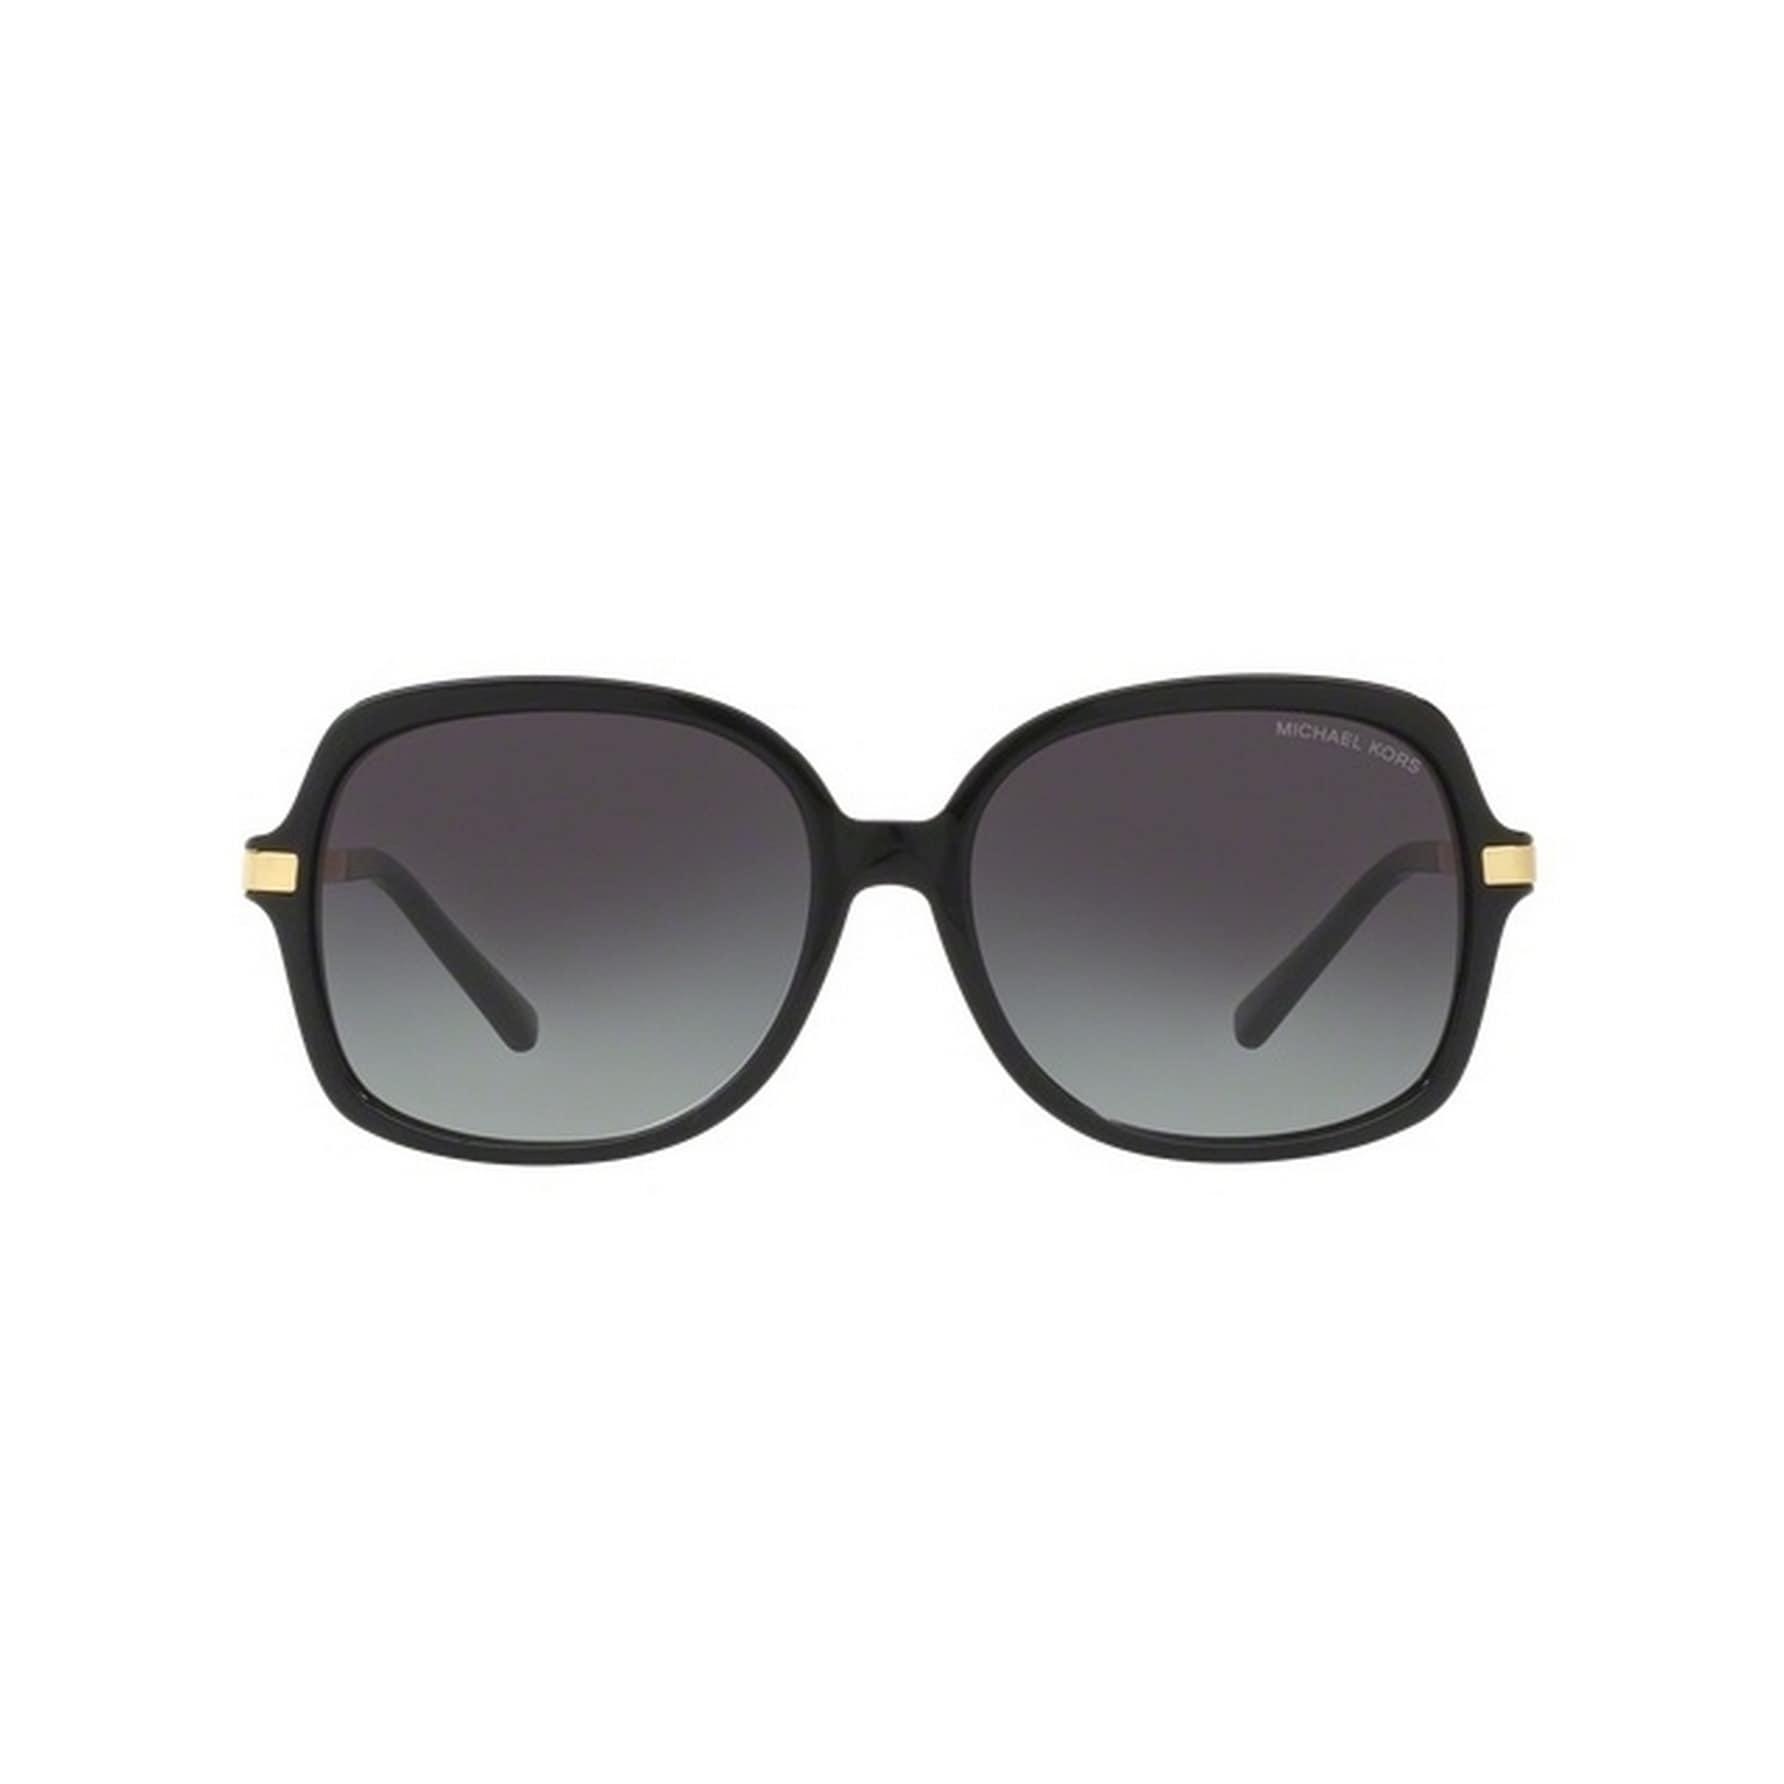 81fed31603e76 Shop Michael Kors Women s MK2024 316011 57 Square Metal Plastic Black Grey  Sunglasses - Free Shipping Today - Overstock.com - 14692019